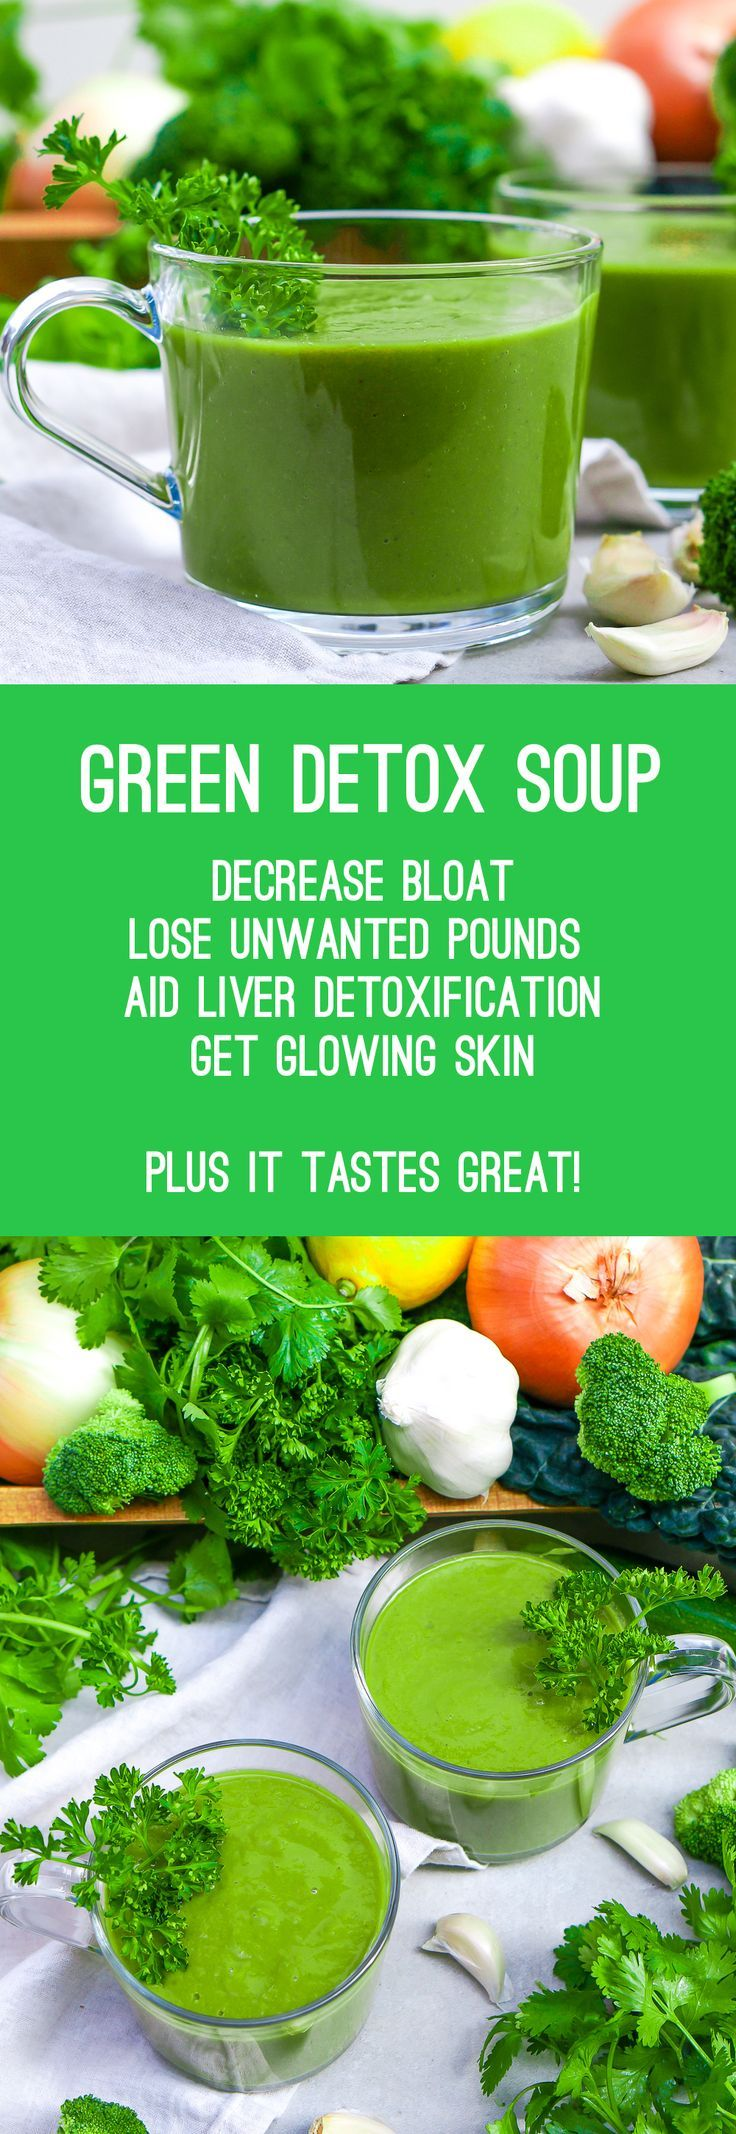 Vegan, Gluten Free, Paleo Detox Soup More More